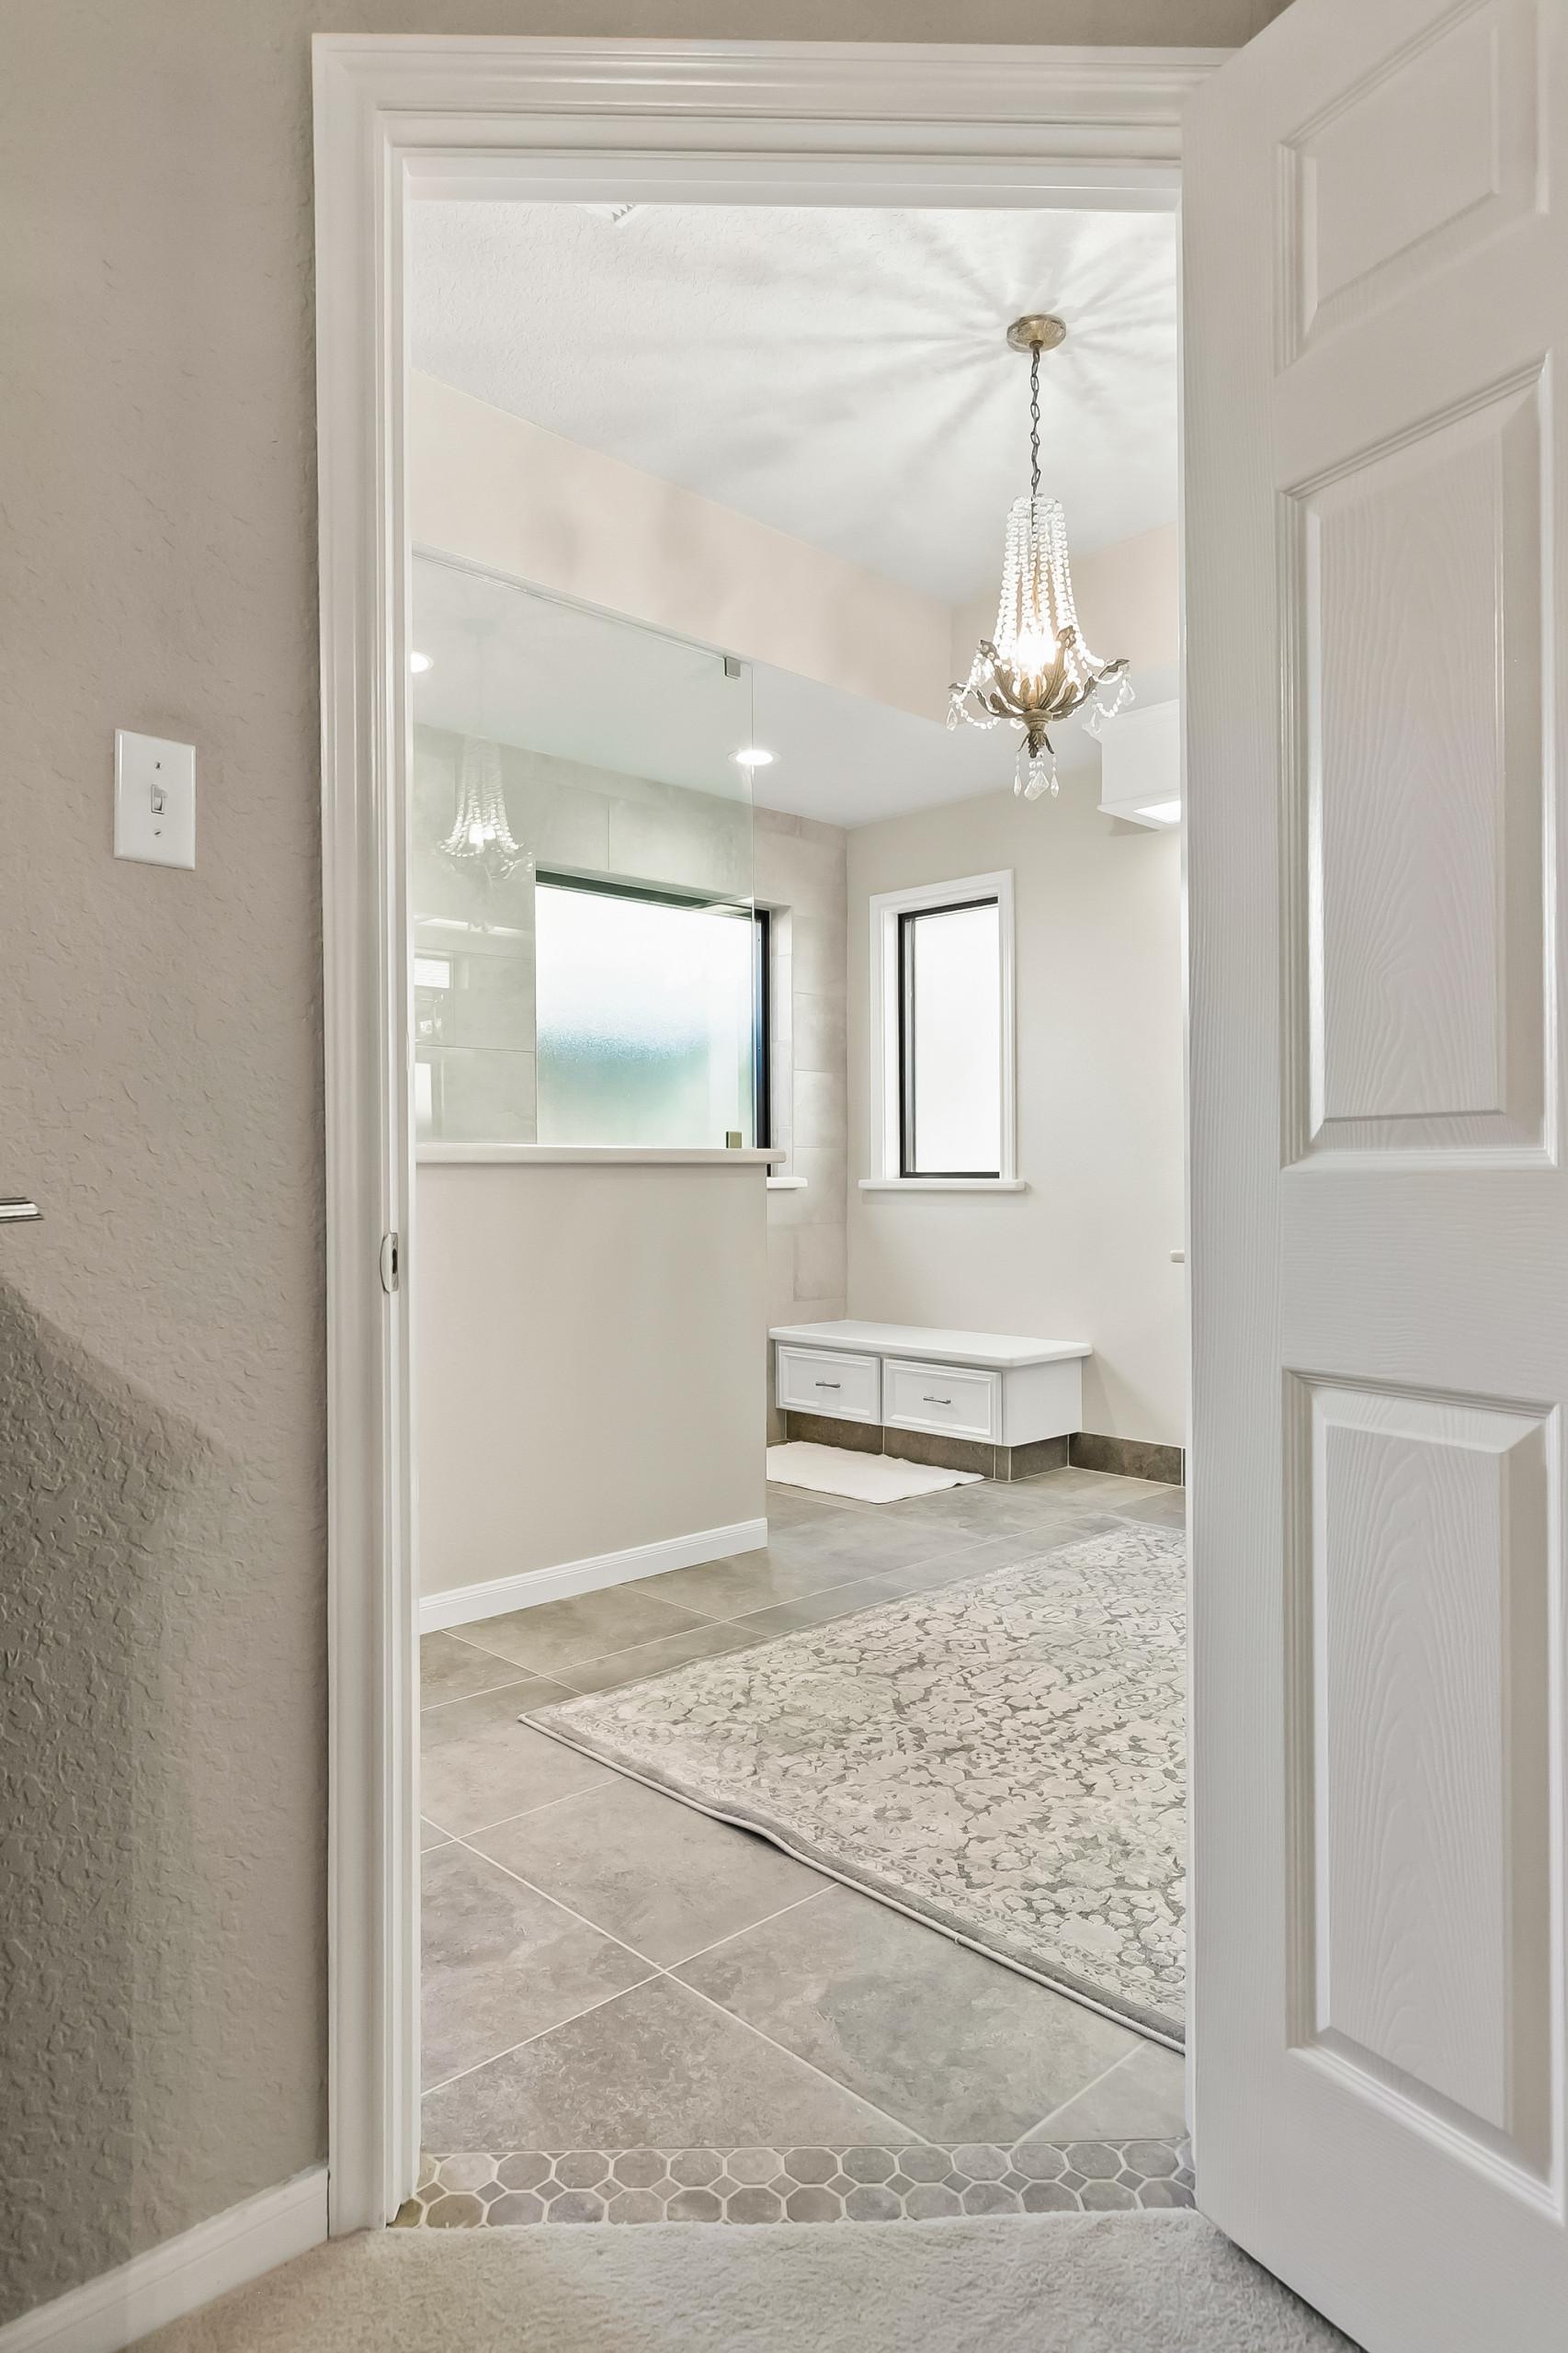 Silverlace Court - Lake Jackson - Main Bathroom Remodel - 2020